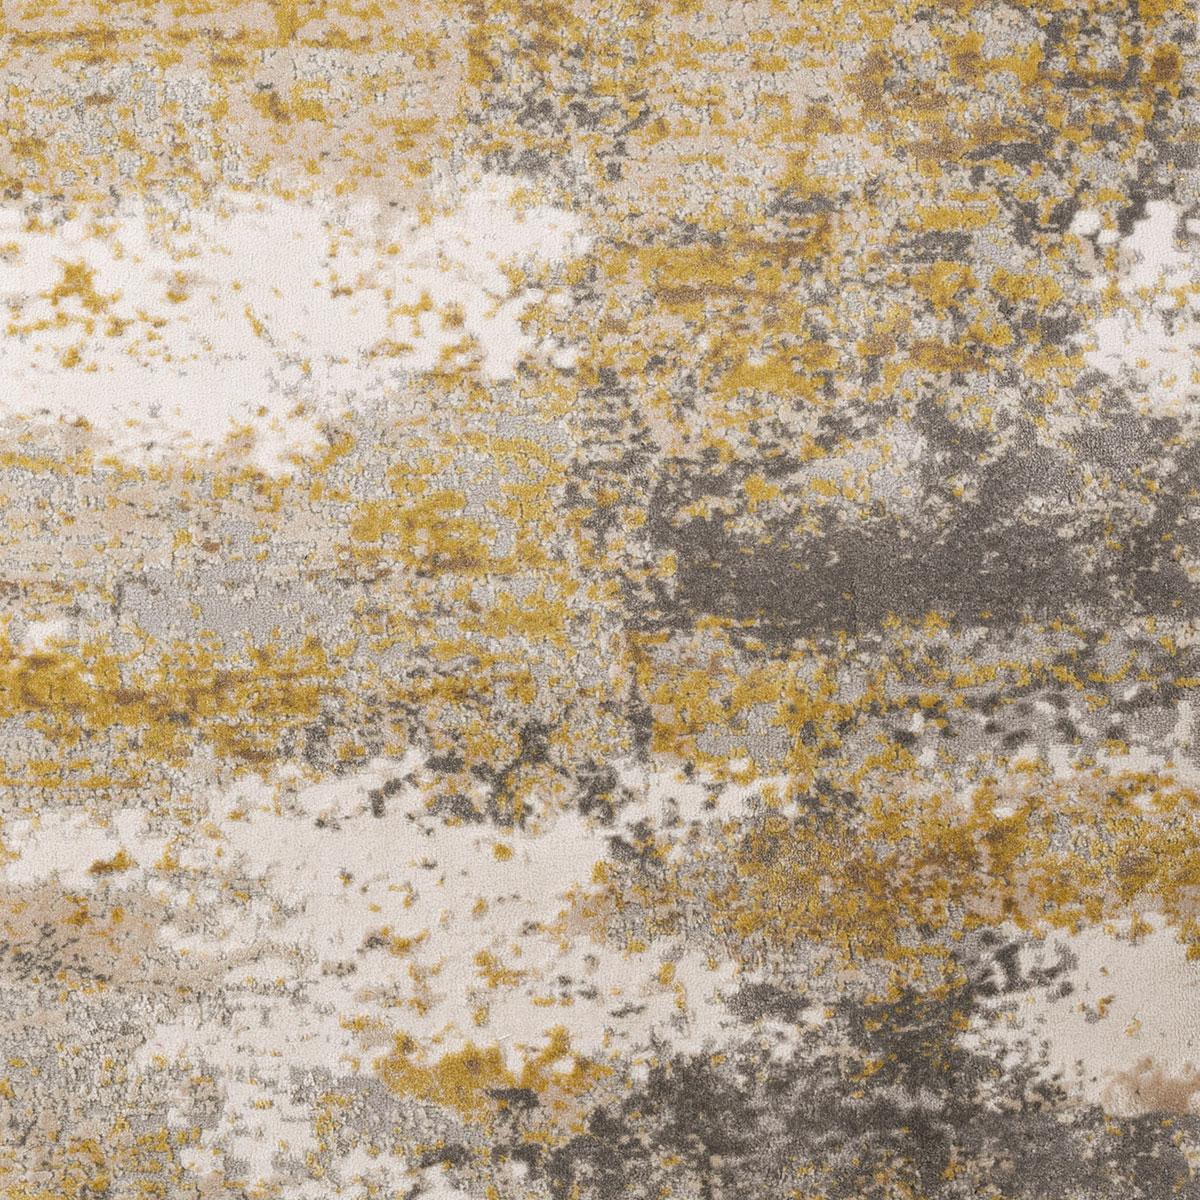 acme_polypropylene-polyester_broadloom_patterson-flynn-martin_pfm